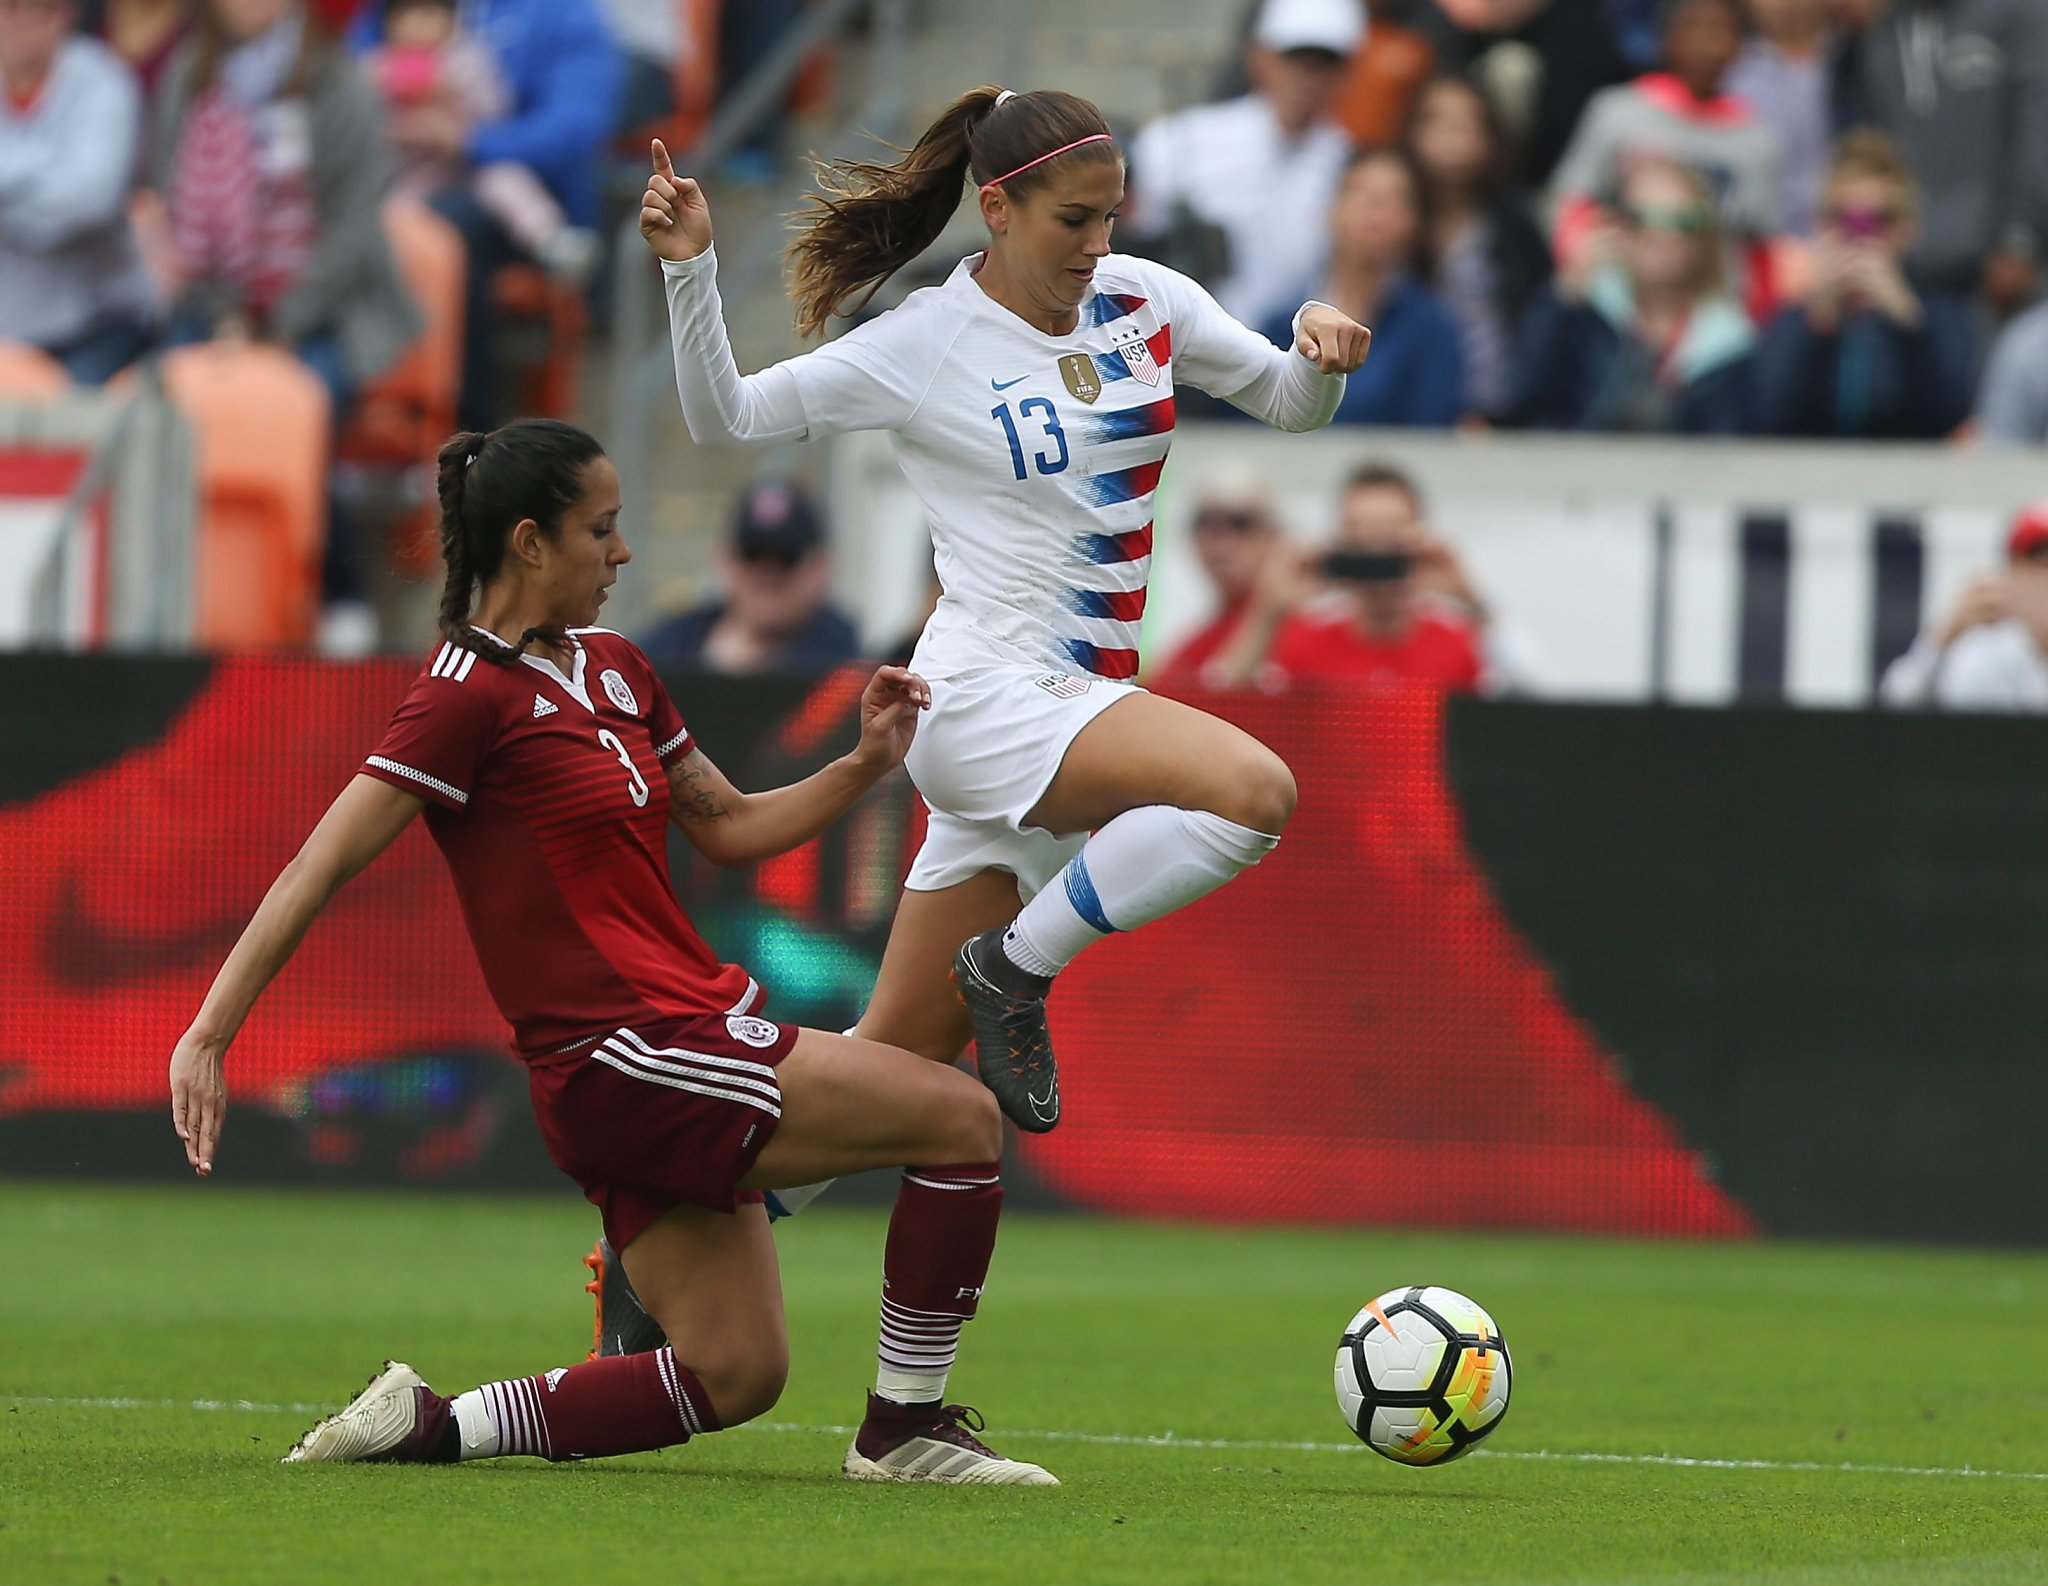 U.S. women's national soccer team returning to Avaya Stadium